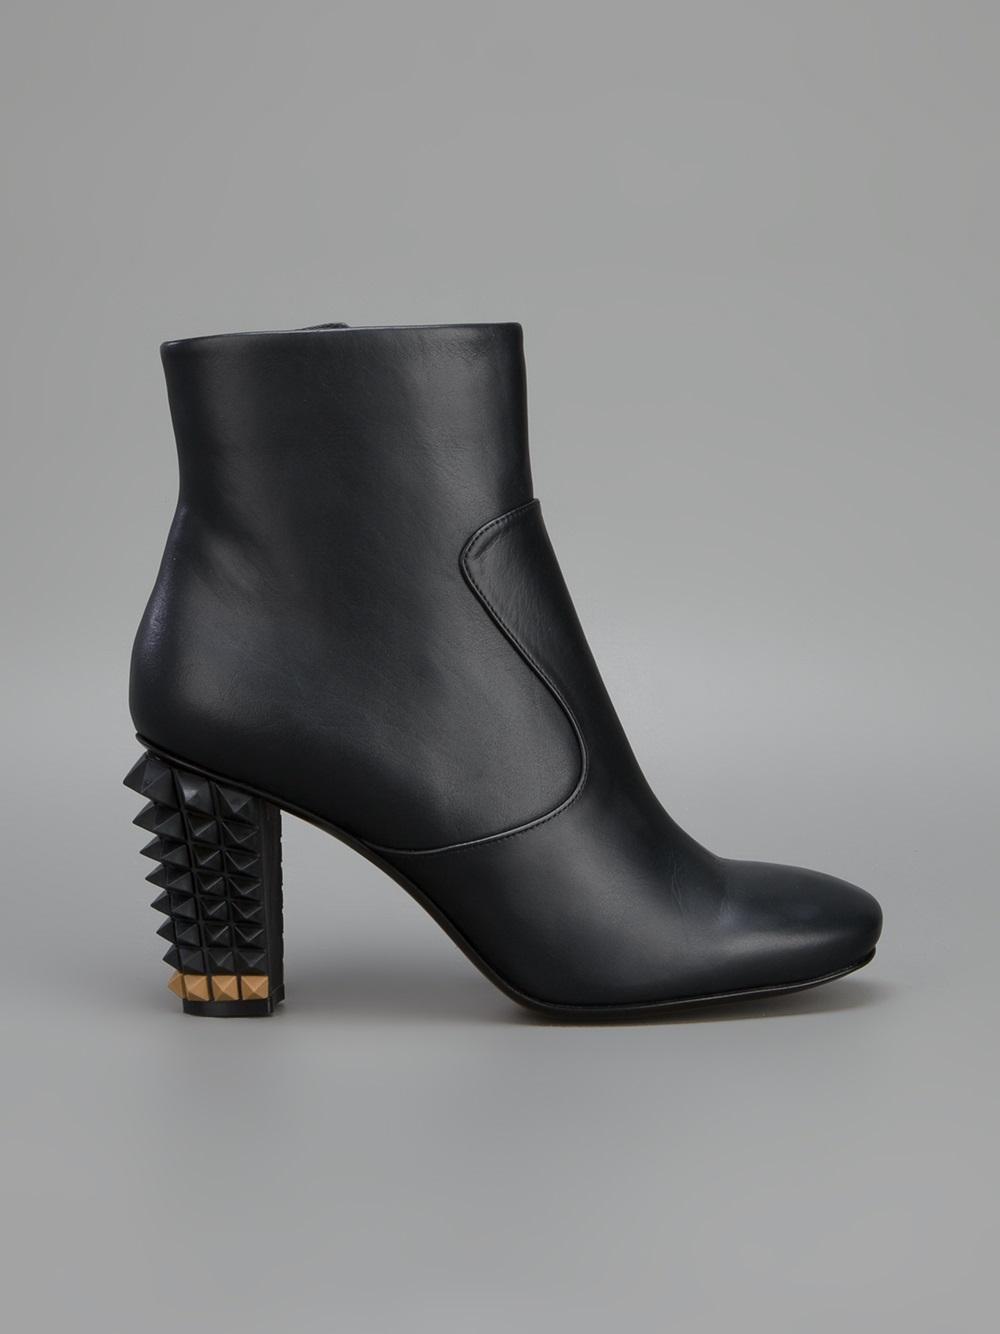 Fendi Spiked Heel Boot in Black